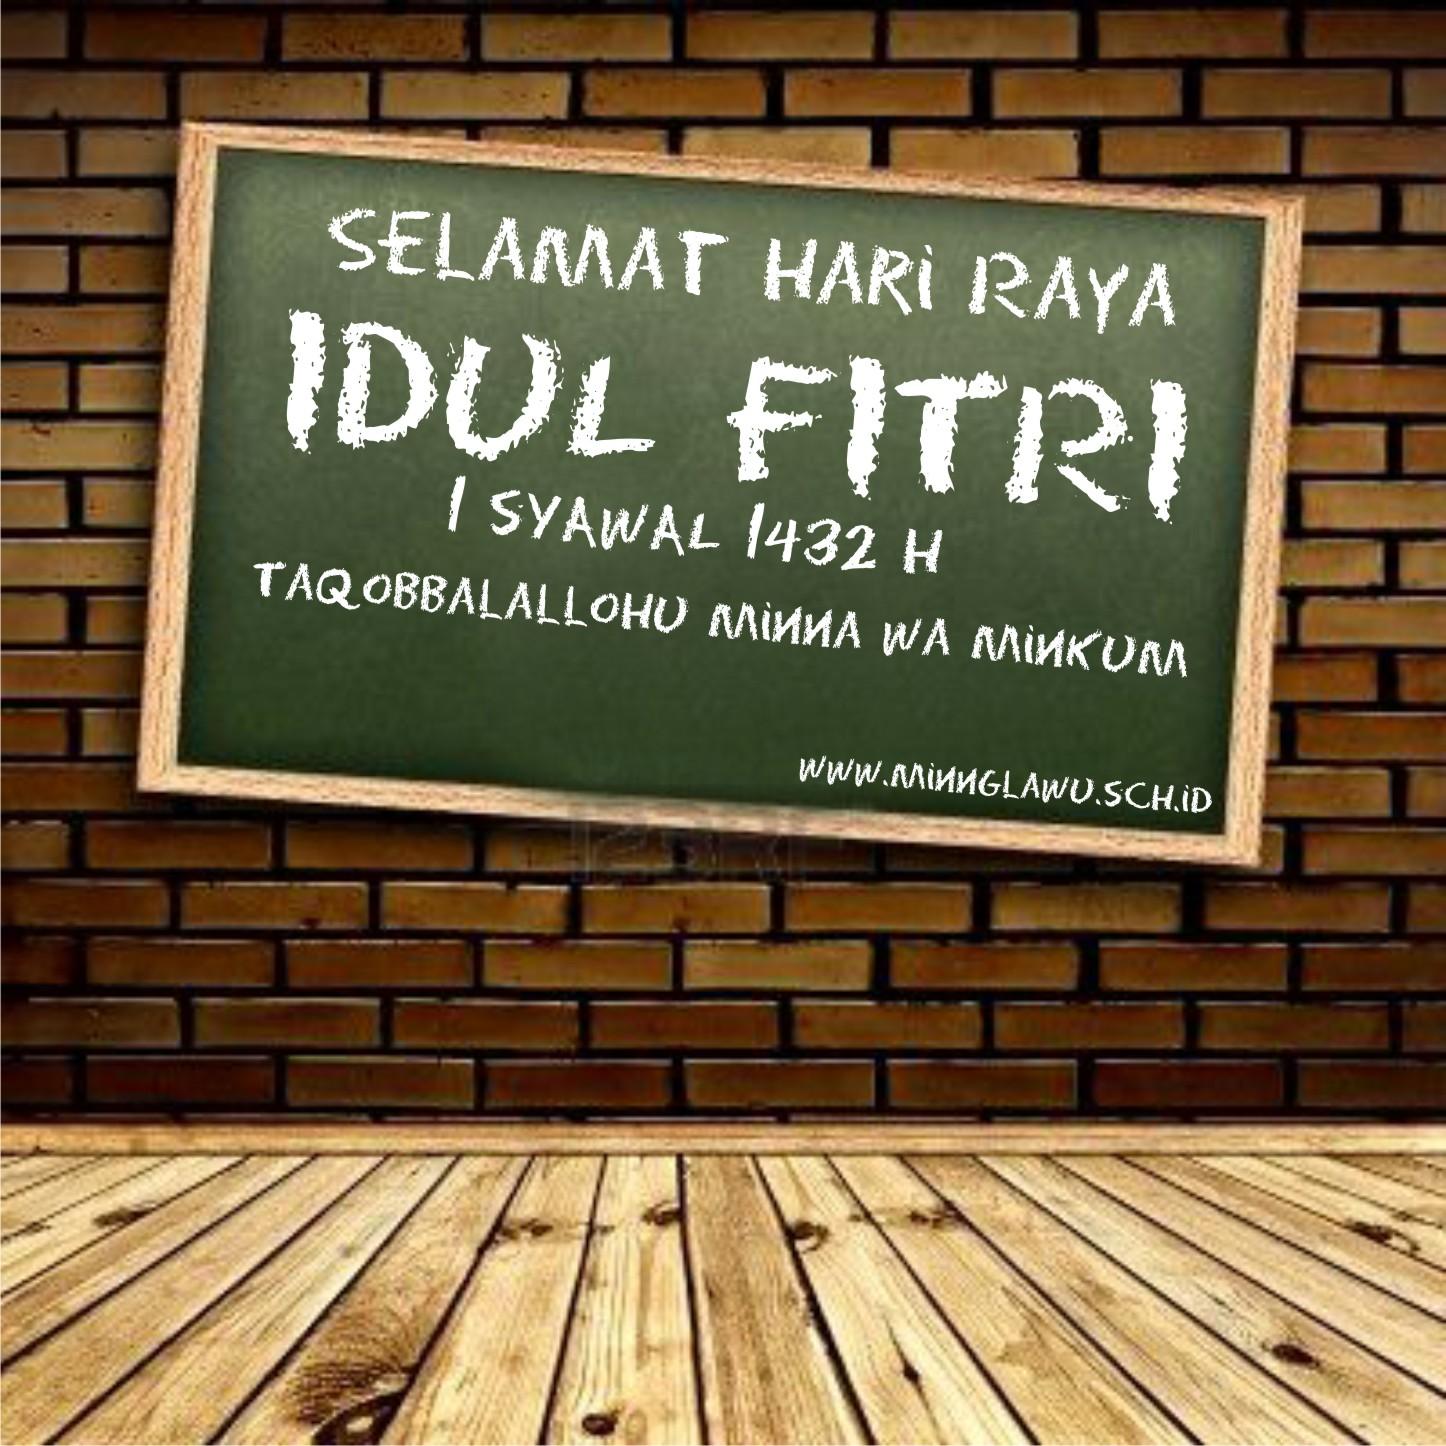 Hari Raya Idul Adha Bahasa Inggris